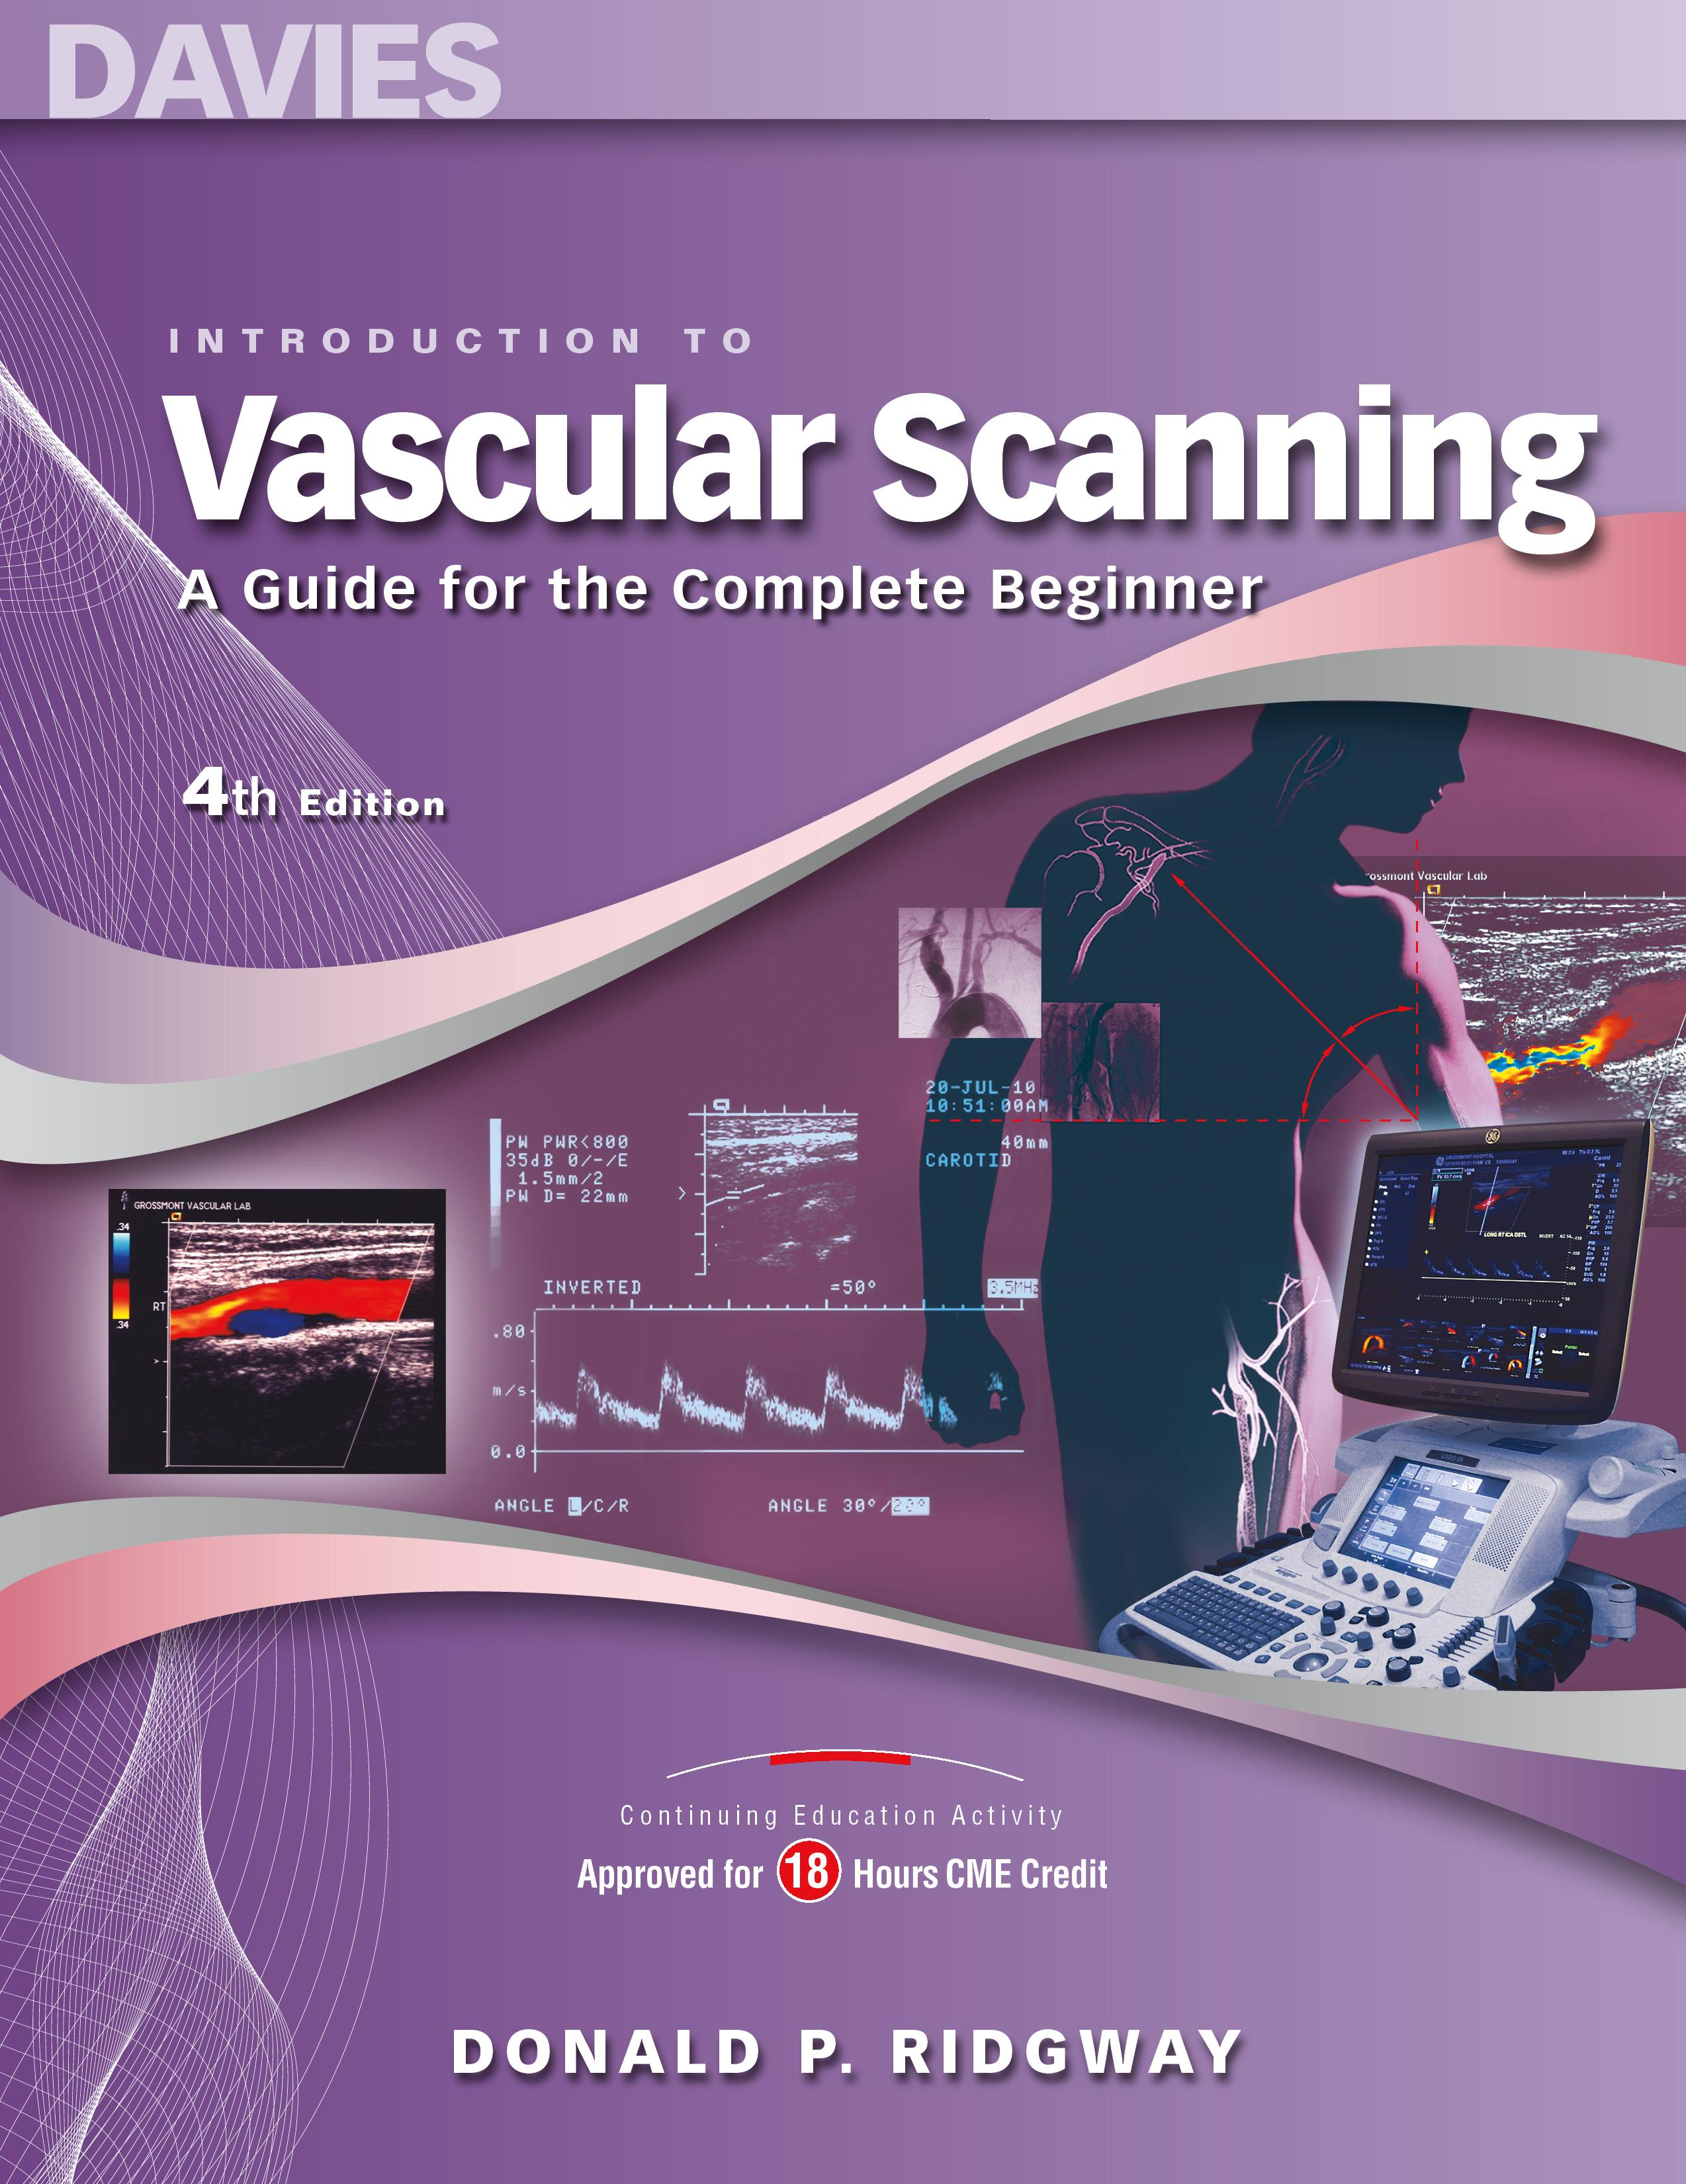 vascular ultrasound, vascular sonography, vascular scanning